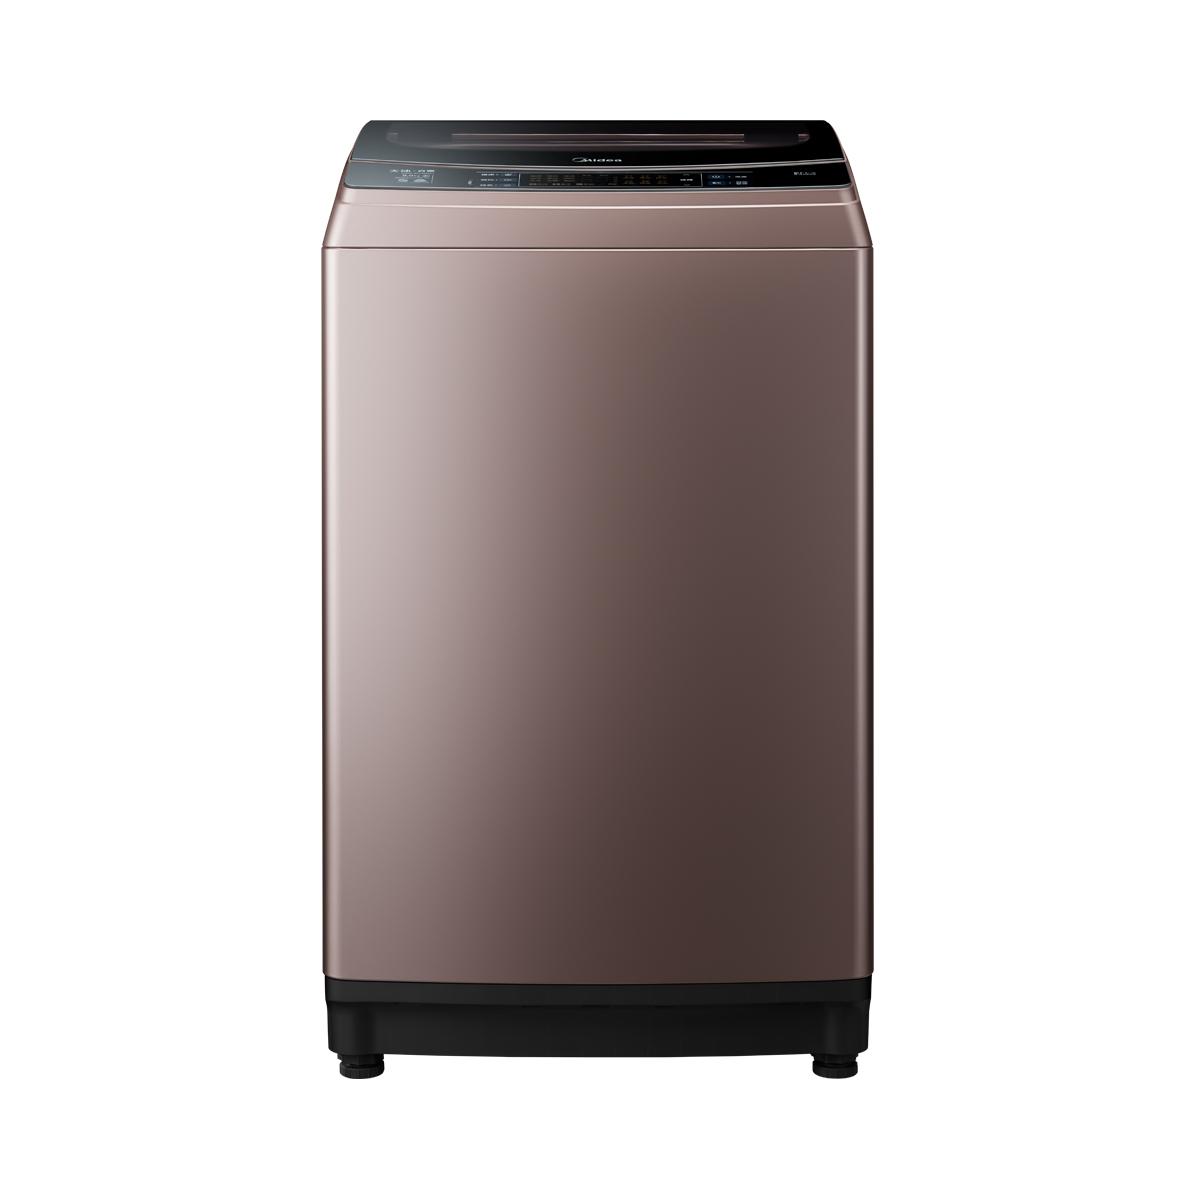 Midea/美的 MB90-8210DQCJ洗衣机 说明书.pdf